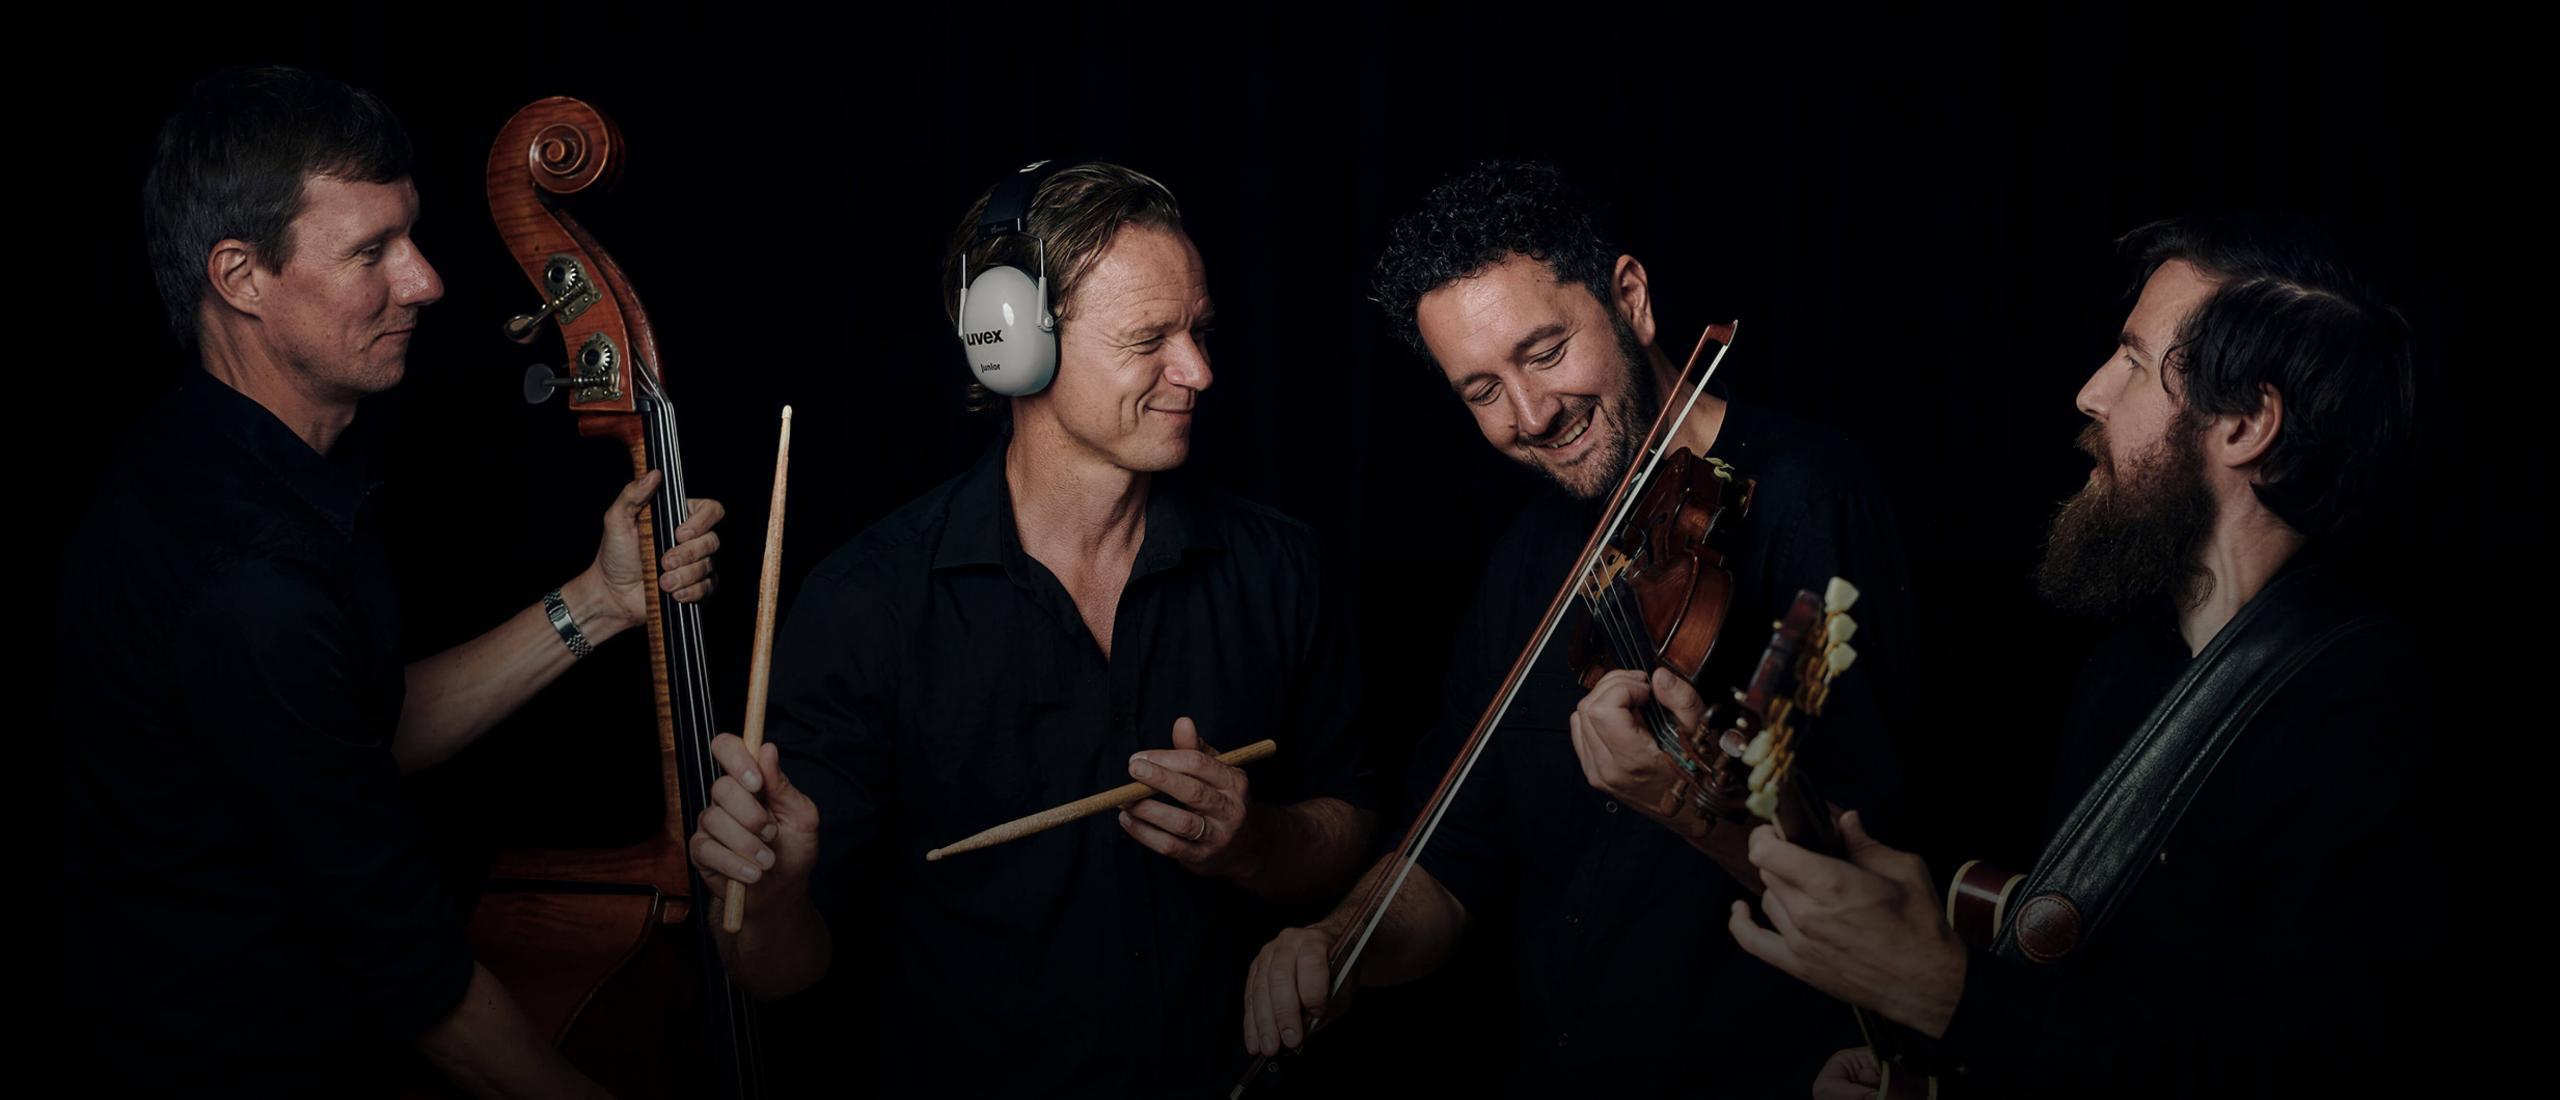 Bjarke Falgren streamed concert on nipalive.ax